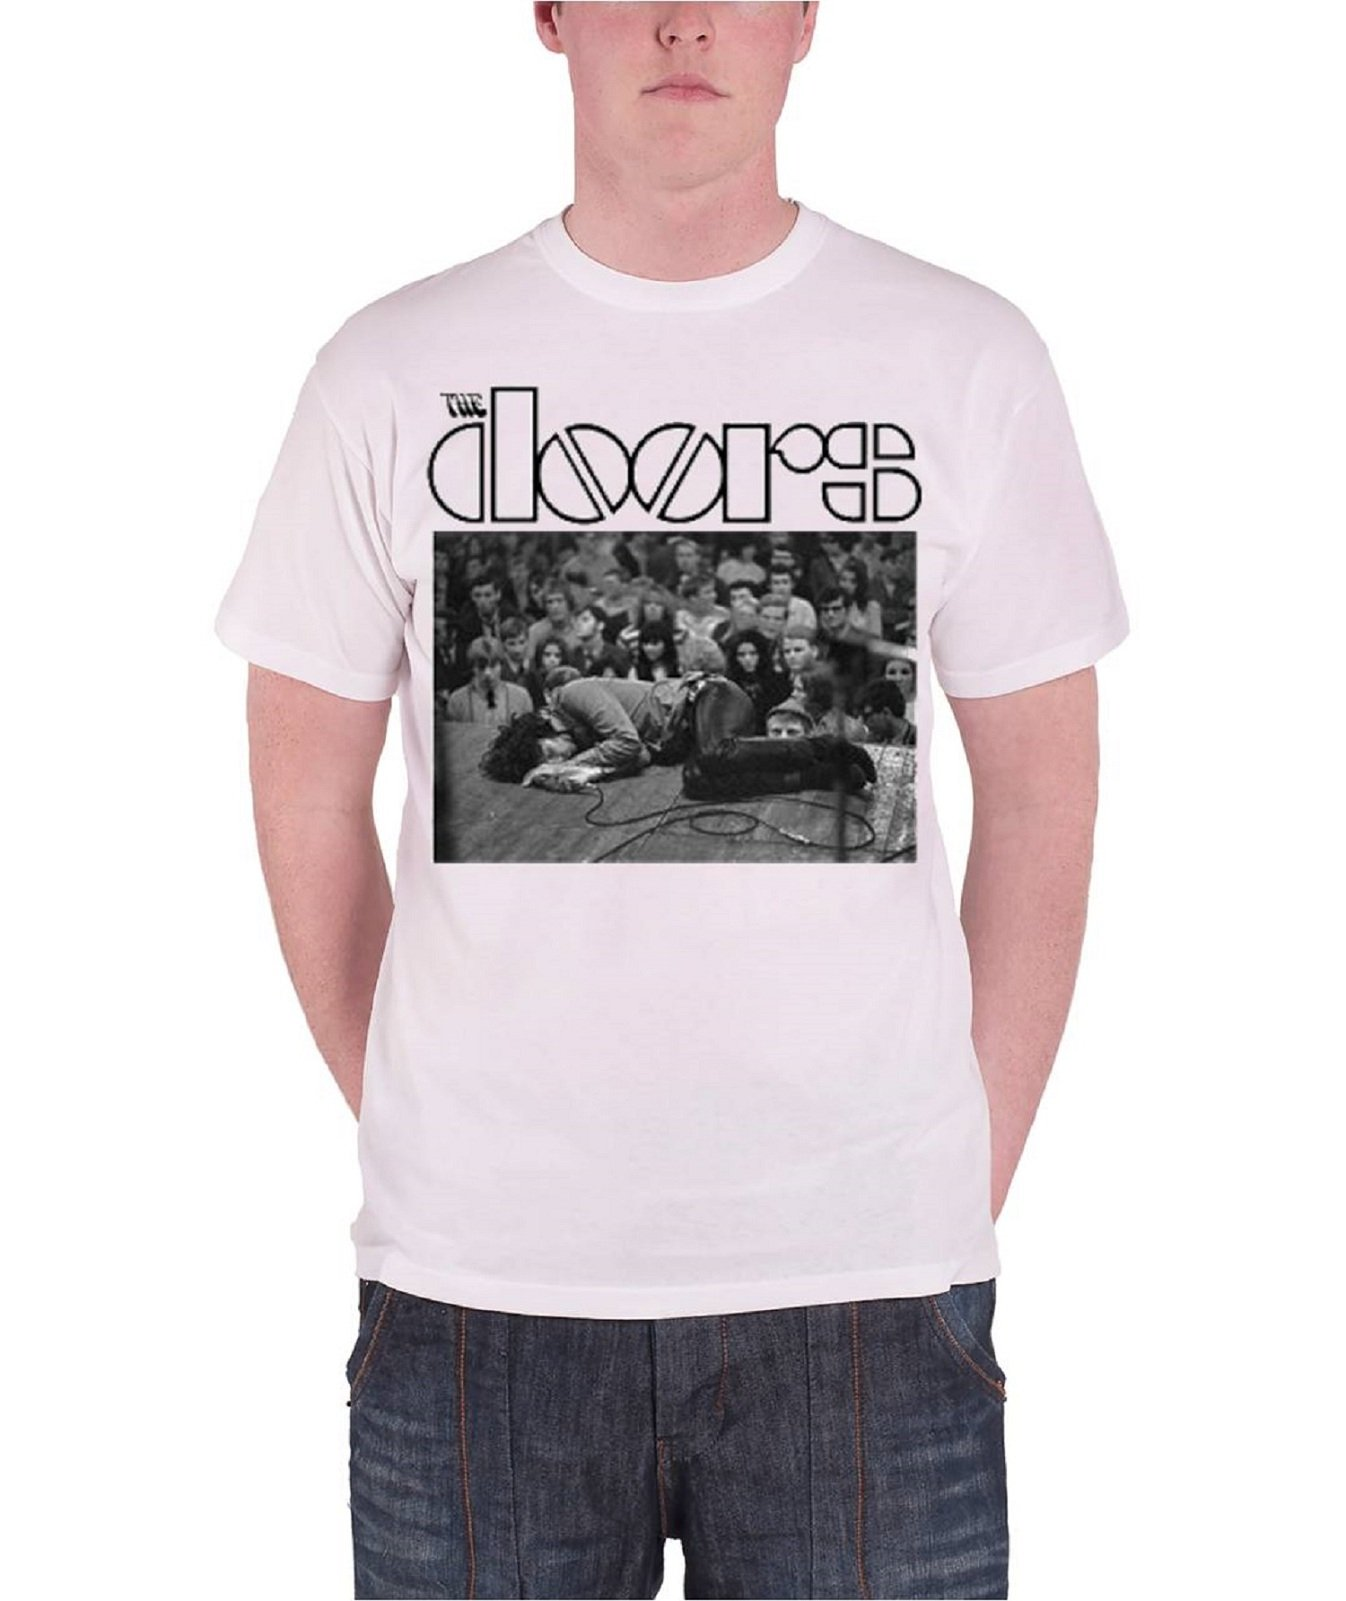 The Doors T Shirt Jim On Floor Band Logo S